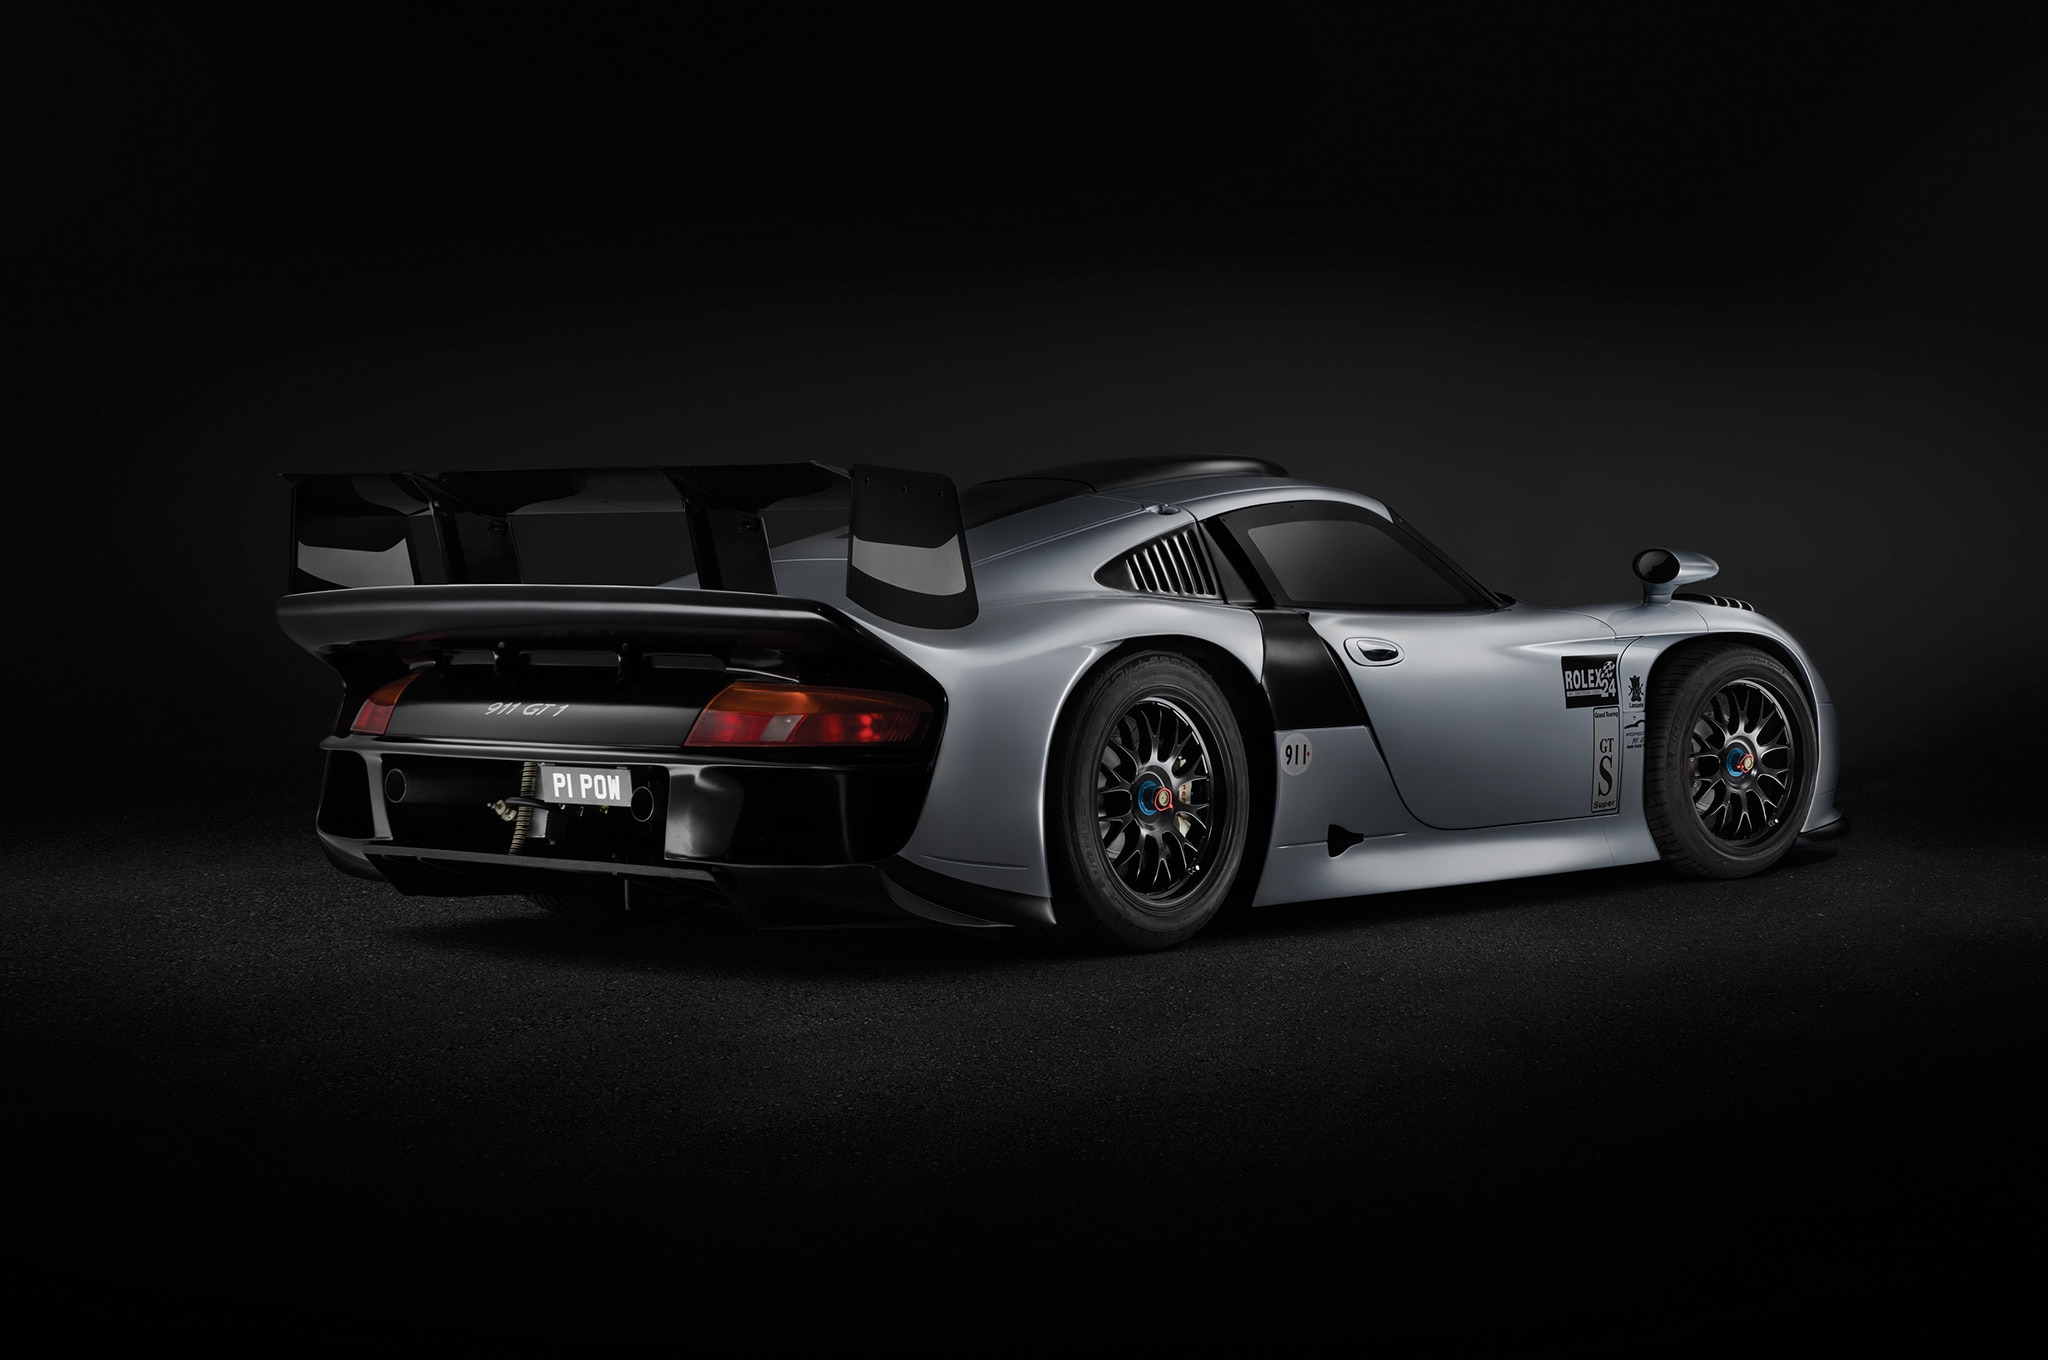 1997-Porsche-911-GT1-Evo-rear-three-quarters Inspiring Porsche 911 Gt1 Road atlanta Cars Trend